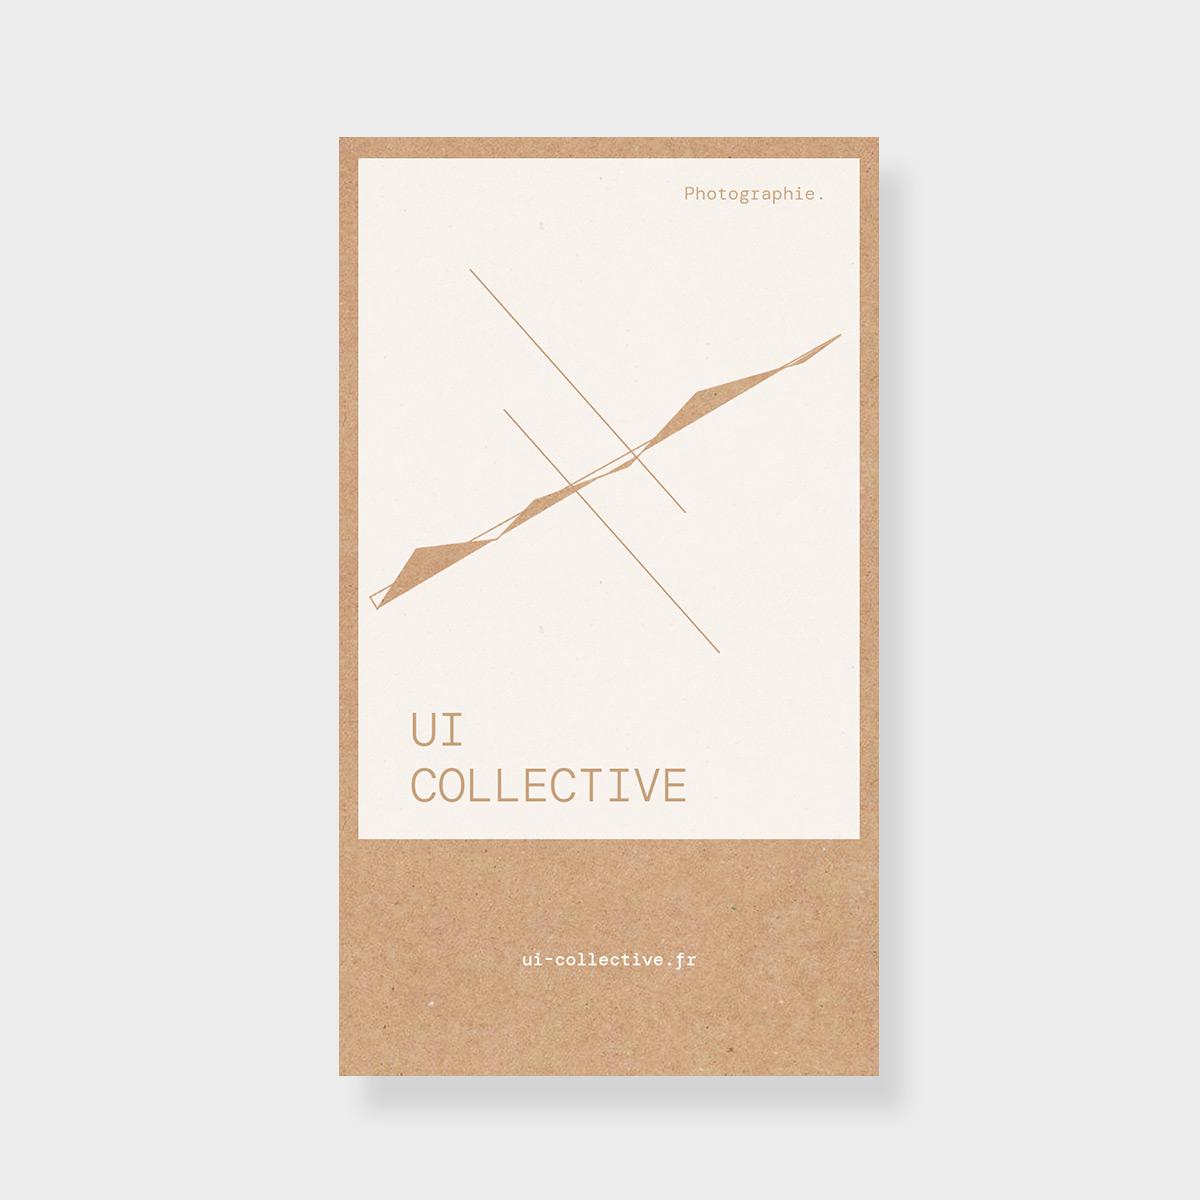 https://isse-ari-design.fr/wp-content/uploads/2020/08/photo-ui-collective.jpg